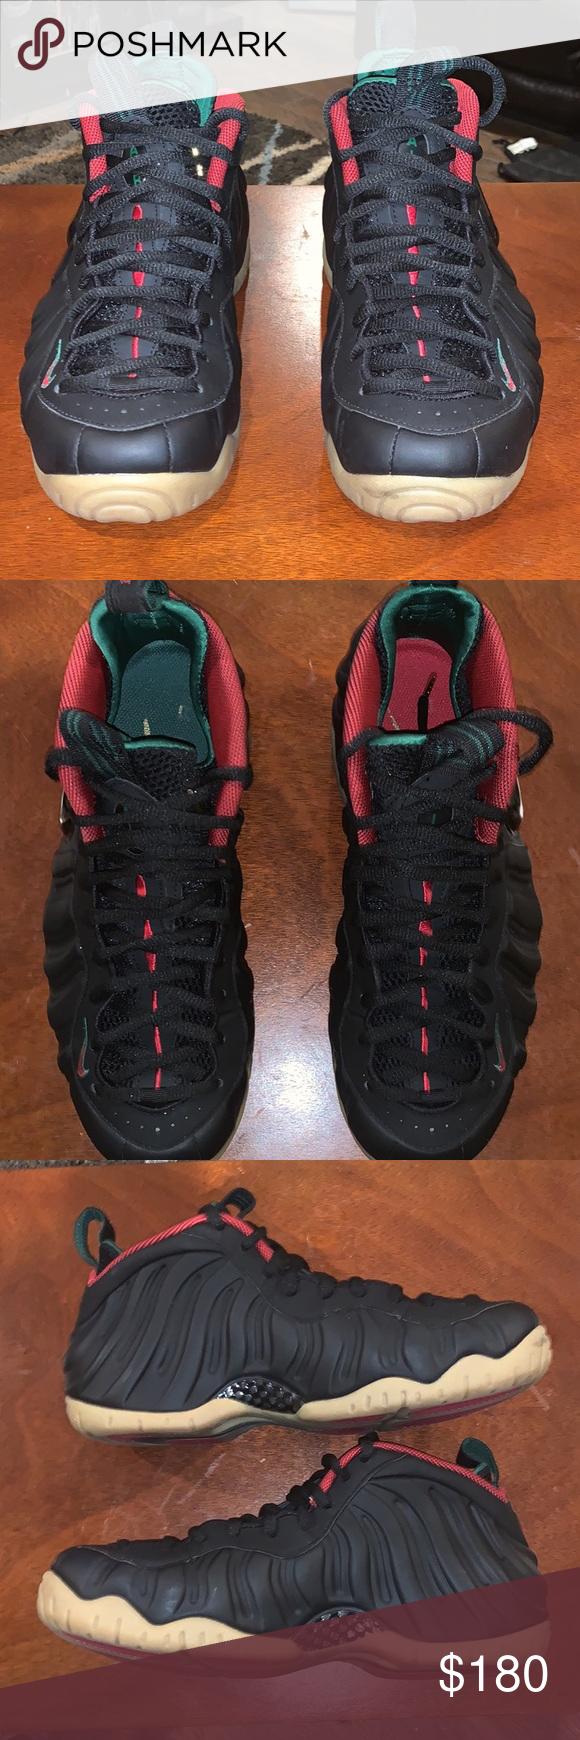 Nike Foamposite pro Foamposite Pro Gucci Style code 624041 004 Comes  original box with receipt for 6703305a6b